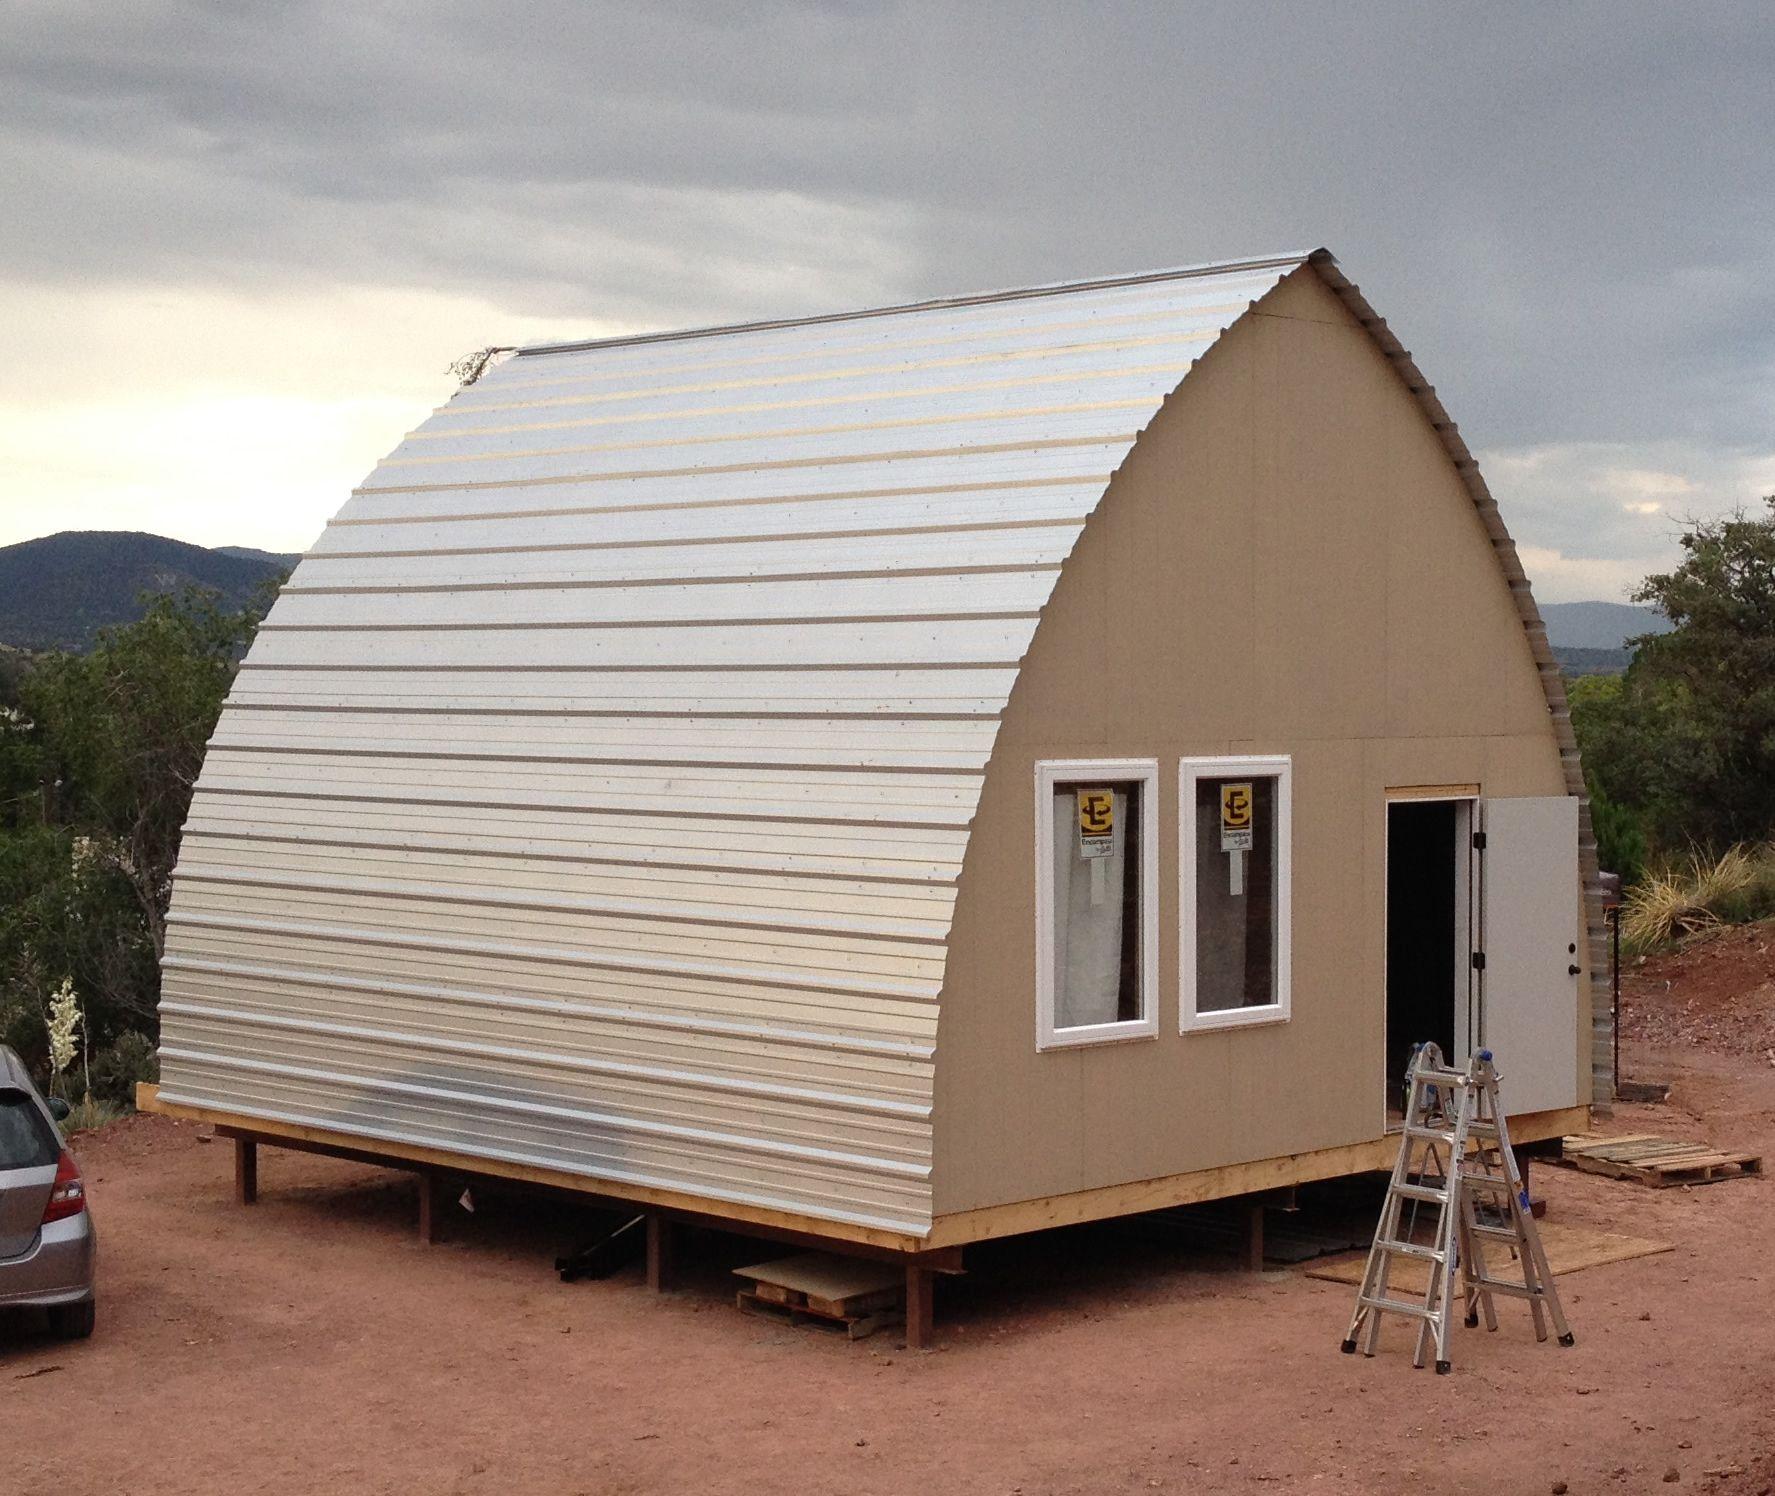 Pin de susana patricia en refugios prefabricados casas - Casas modulares moviles ...